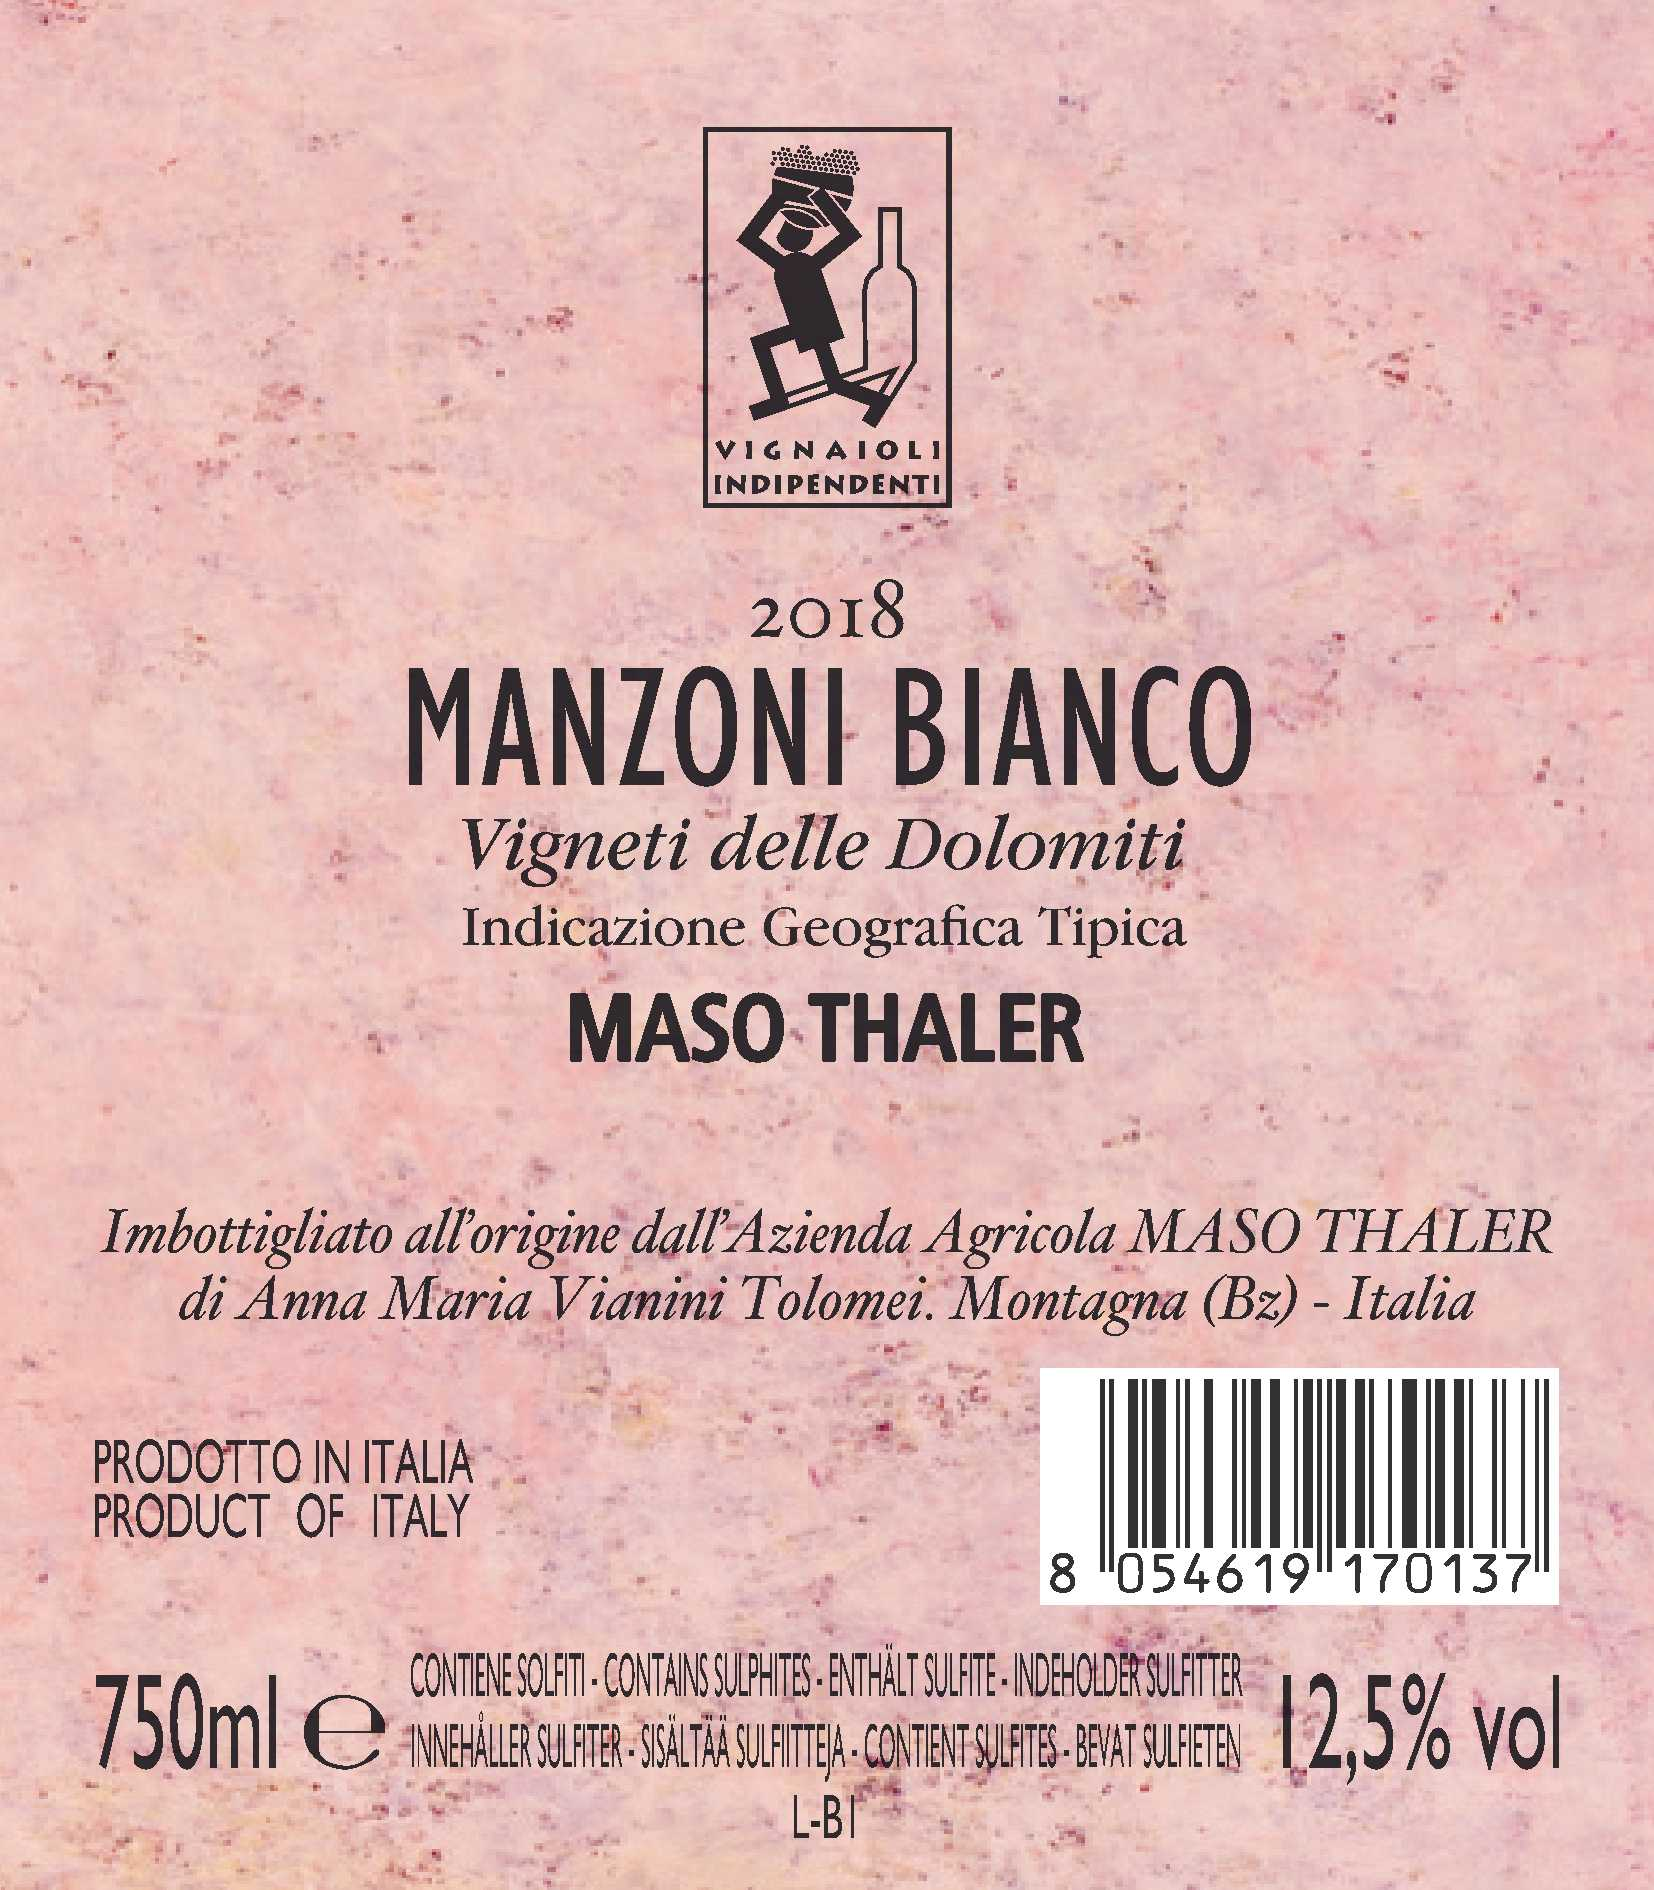 Ret Manzoni Bianco 18 170137.jpg